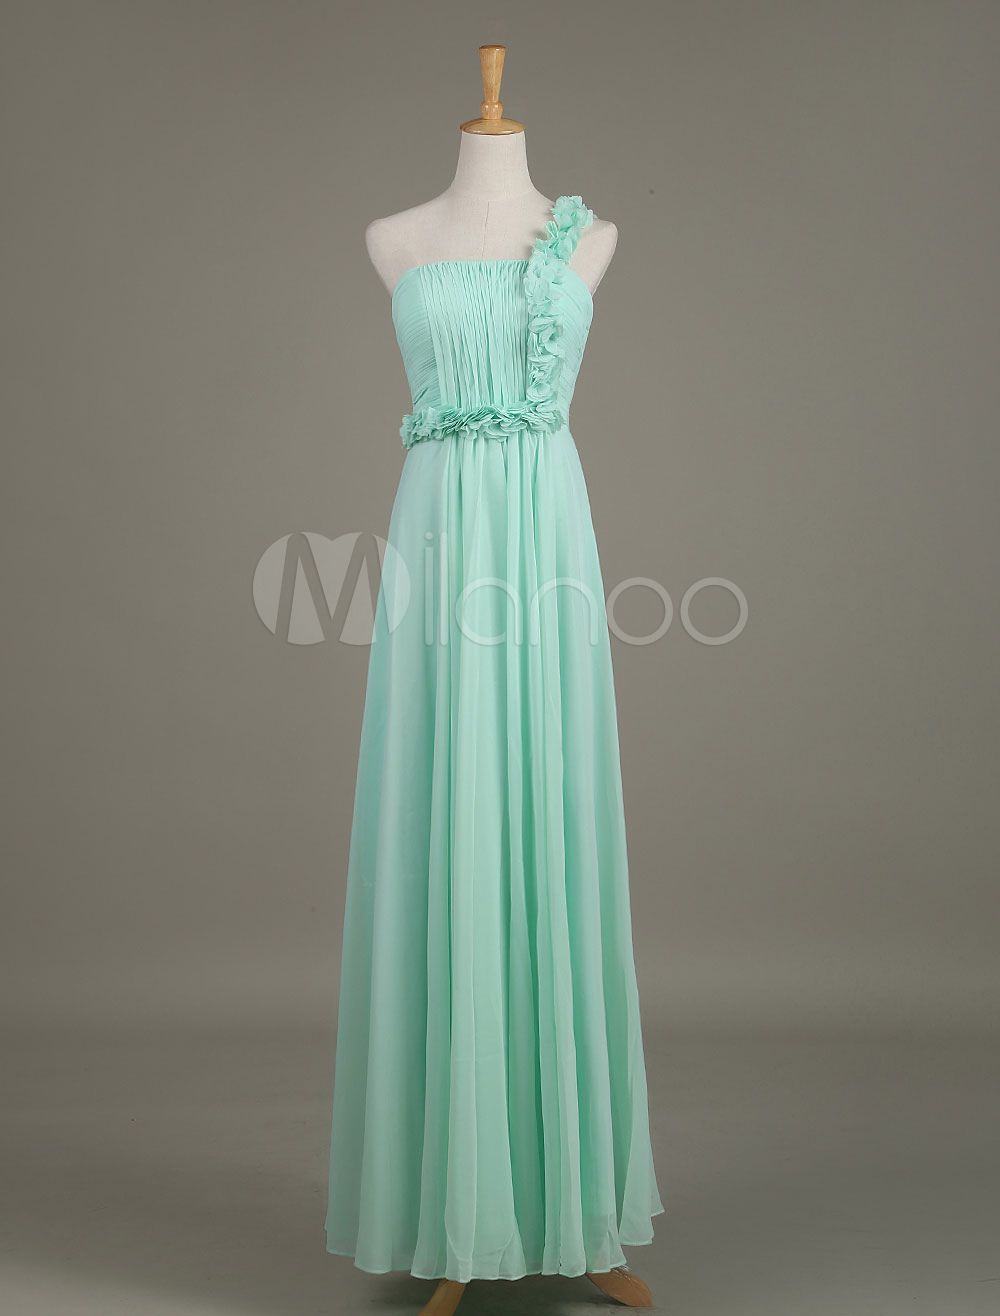 Mint Bridesmaid Dress Chiffon Flower One Shoulder Draped A Line Long Wedding Party Dress